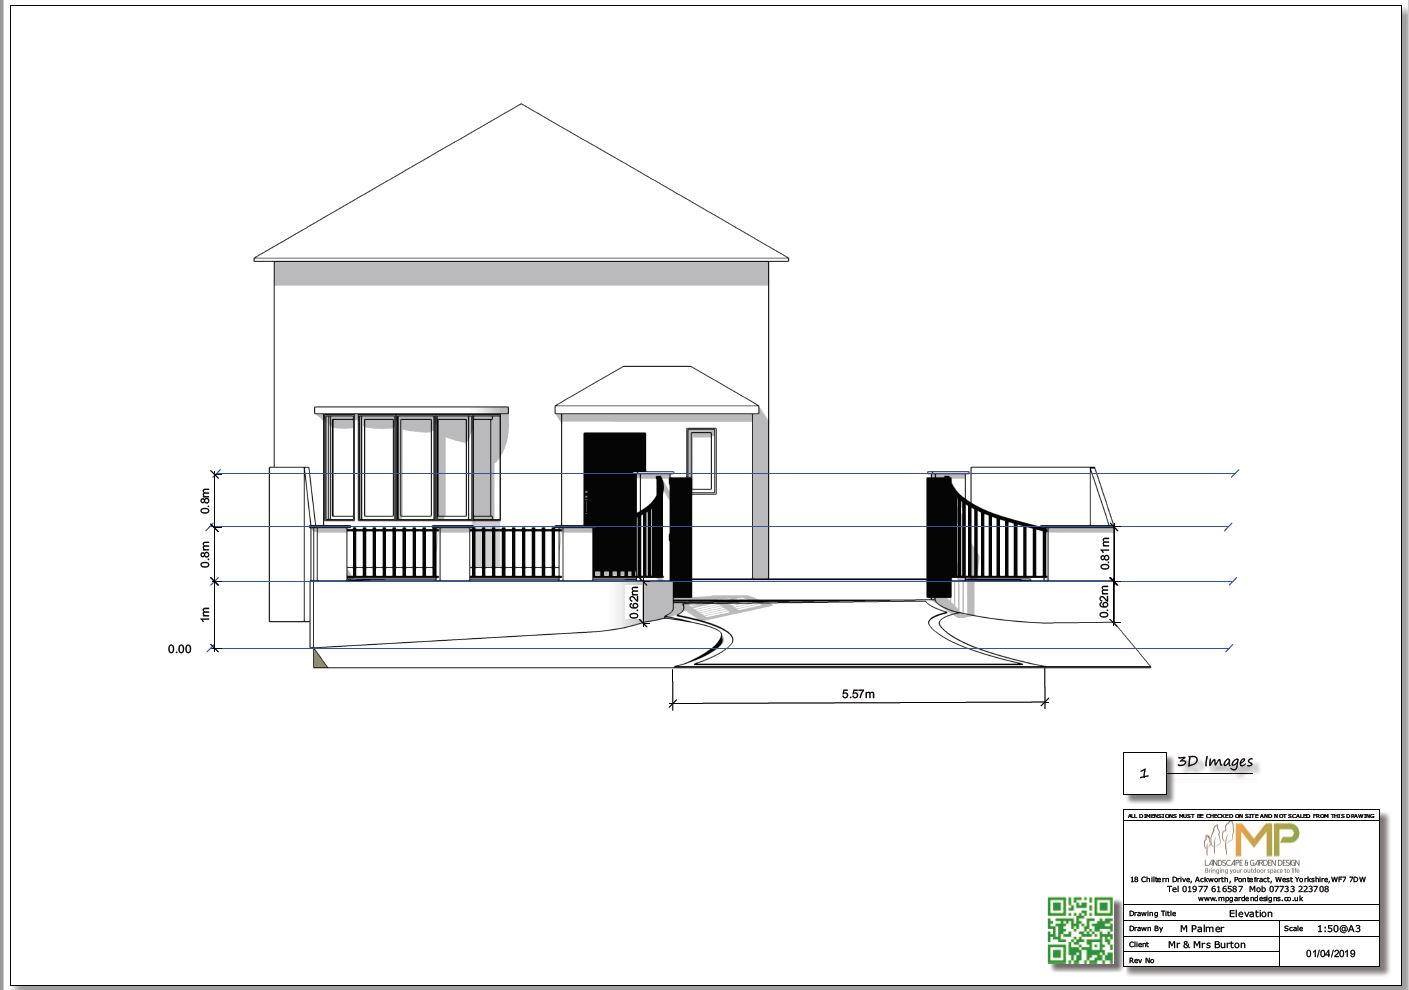 Black and white arden design plans, 3D, Ackworth.